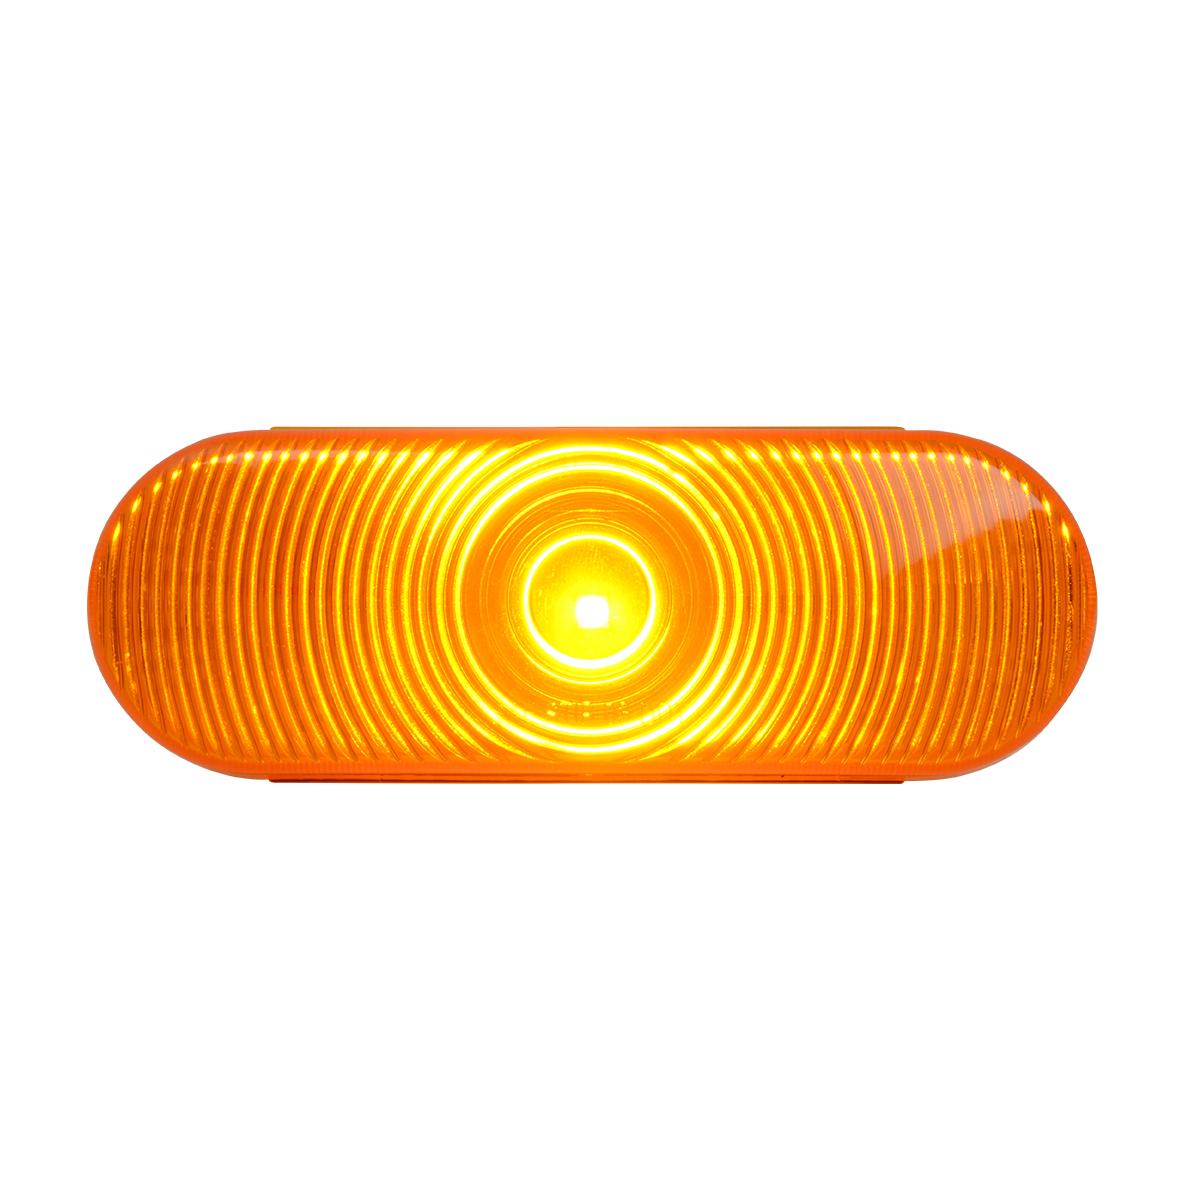 75850 Oval Single High Power LED Sealed Light